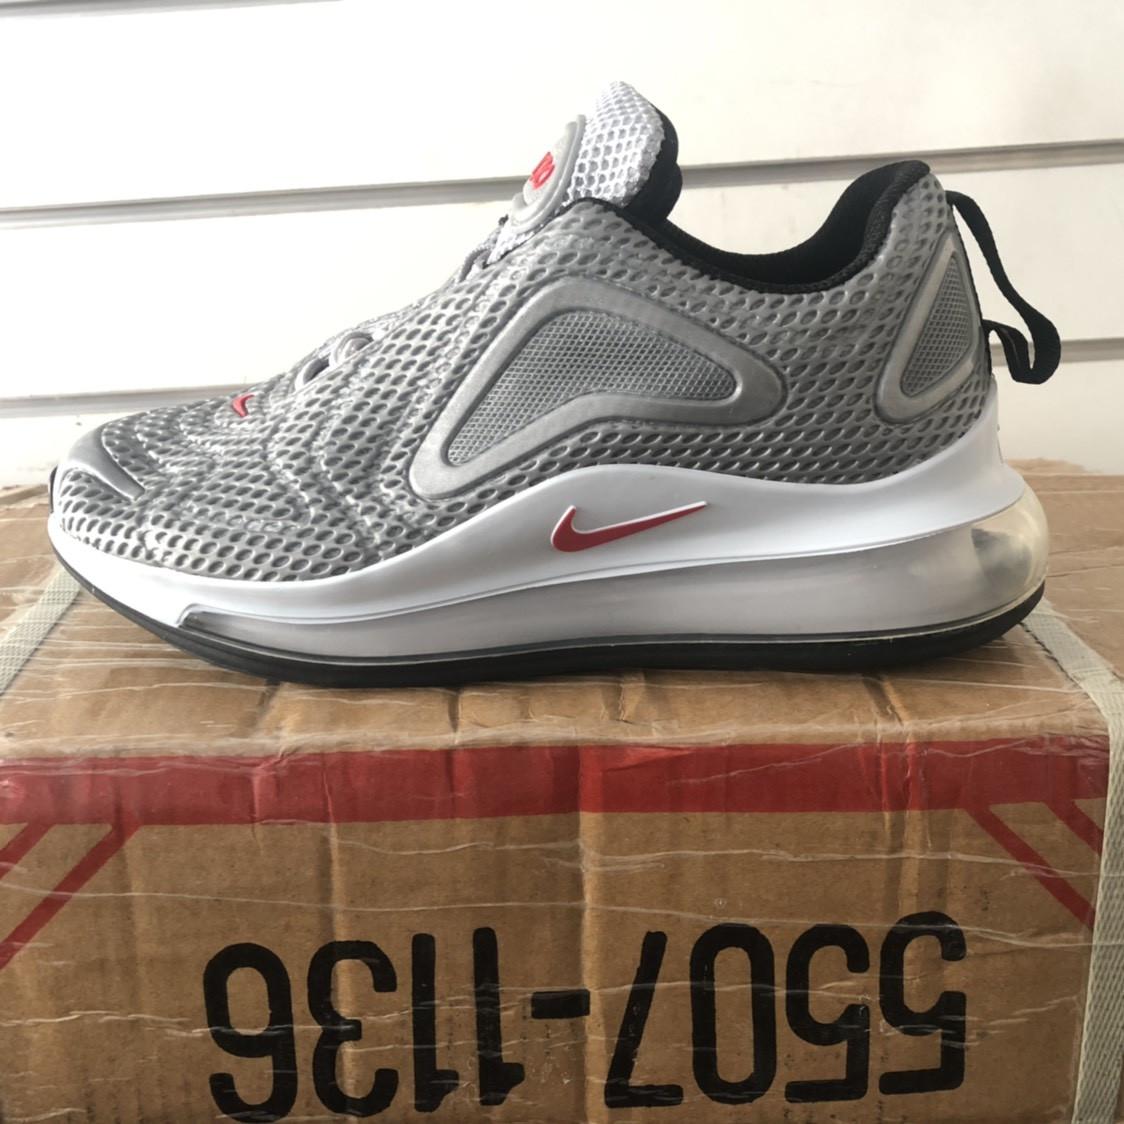 Кроссовки подросток Nike оптом (36-41)